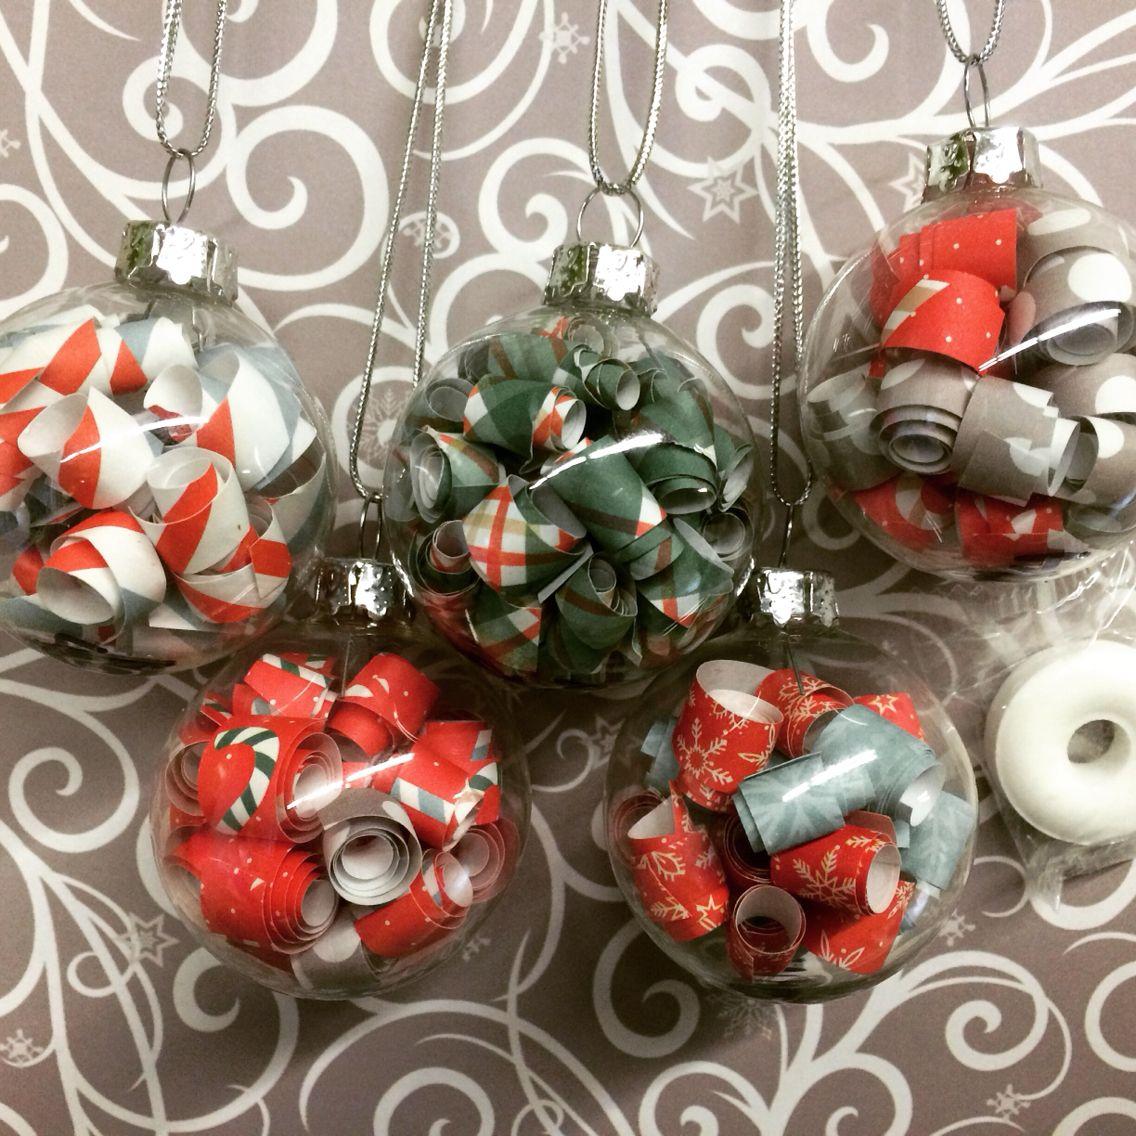 Tiny Christmas.My 4th And 5th Grade Class Made This Craft Tiny Christmas